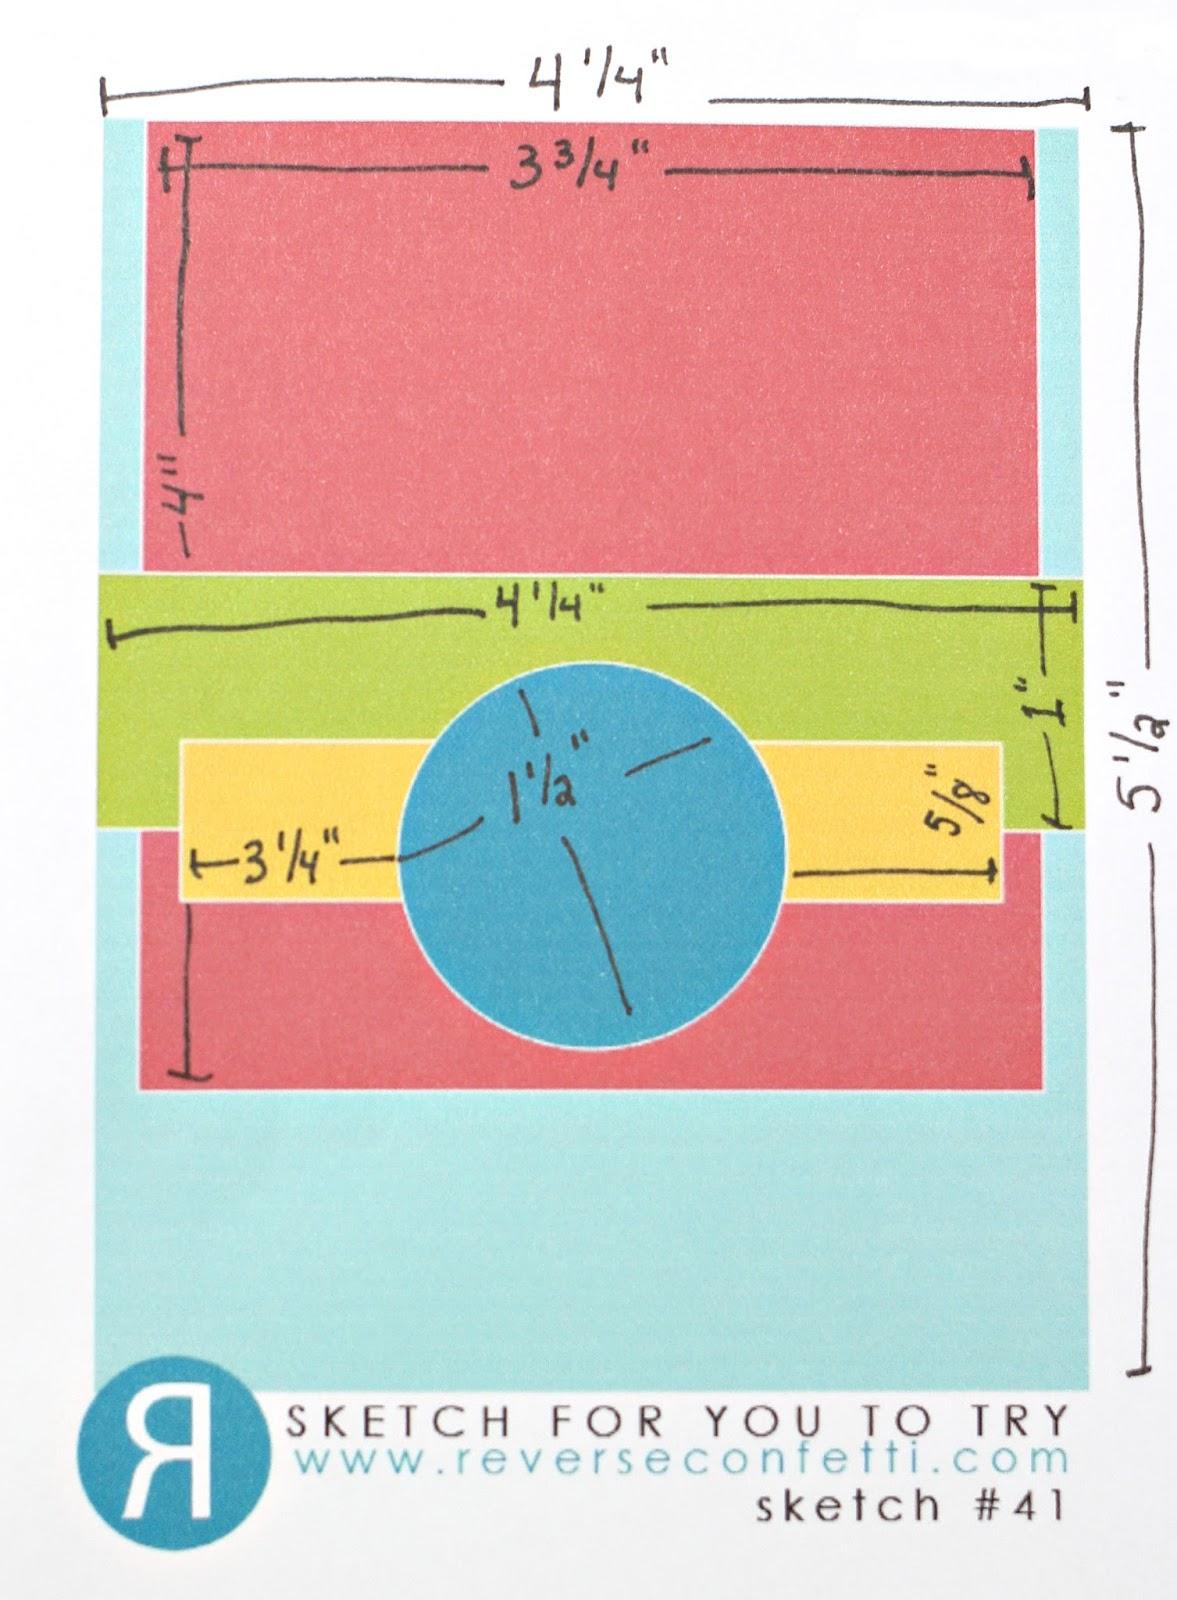 Cream colored cardstock paper studio - Bling The Paper Studio